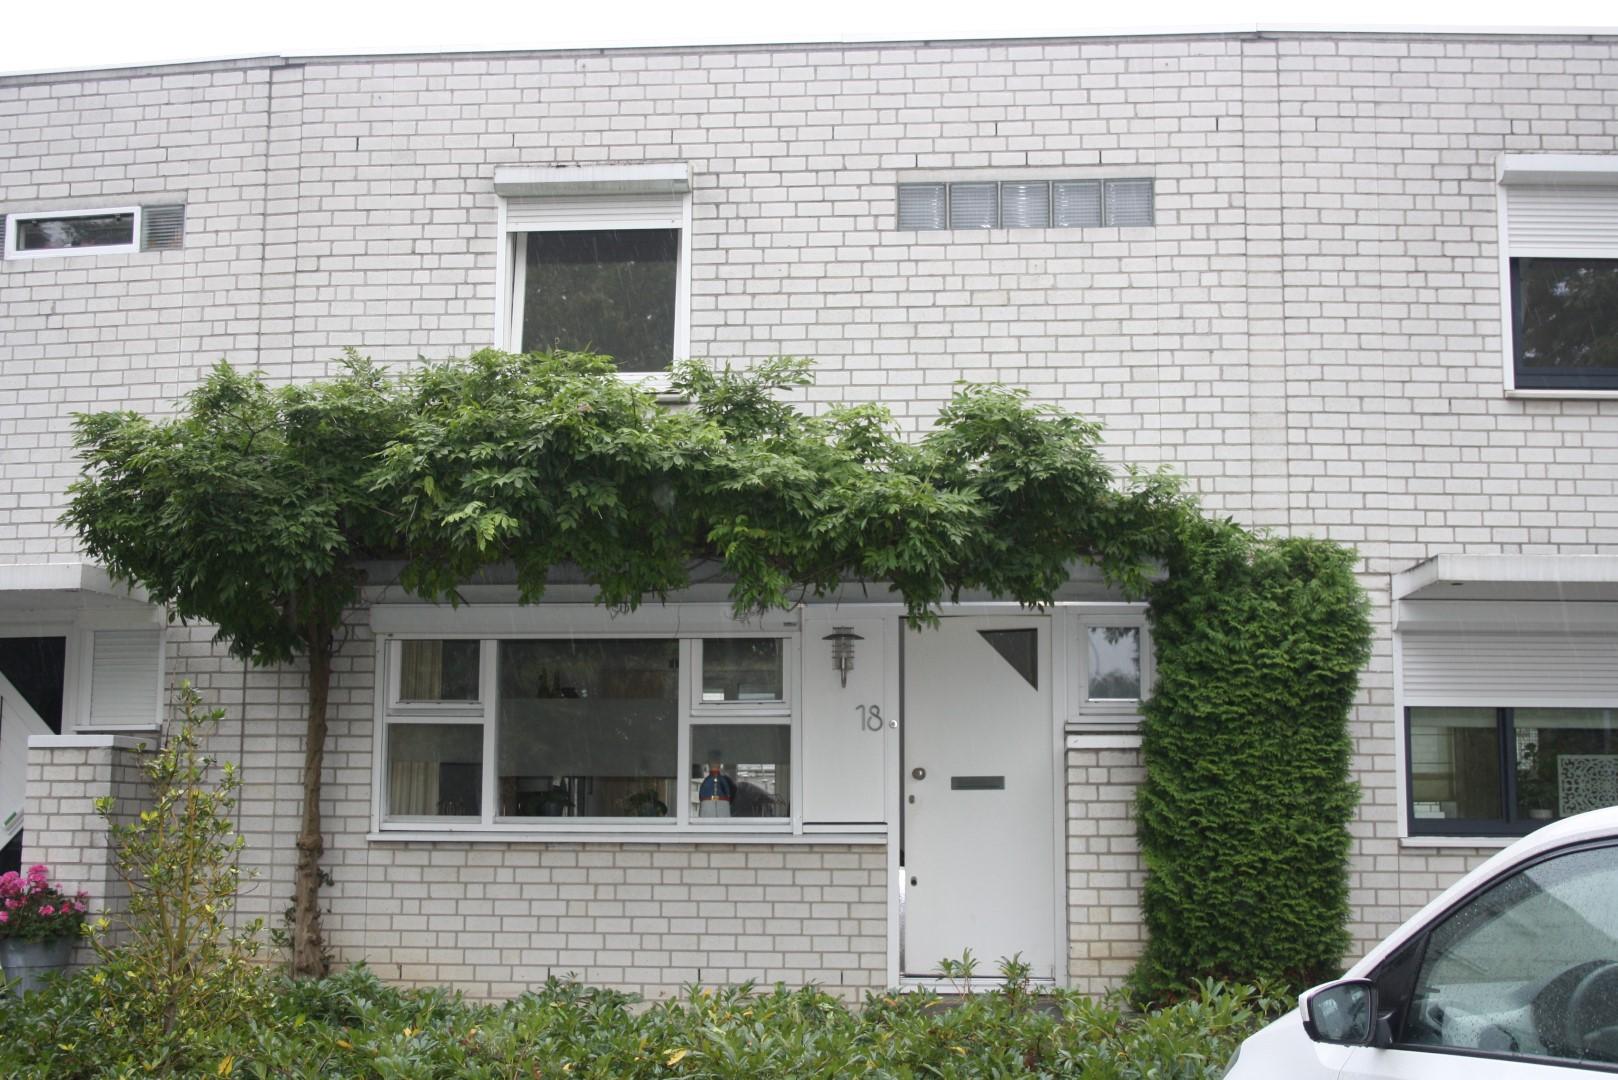 Plantagobeemd